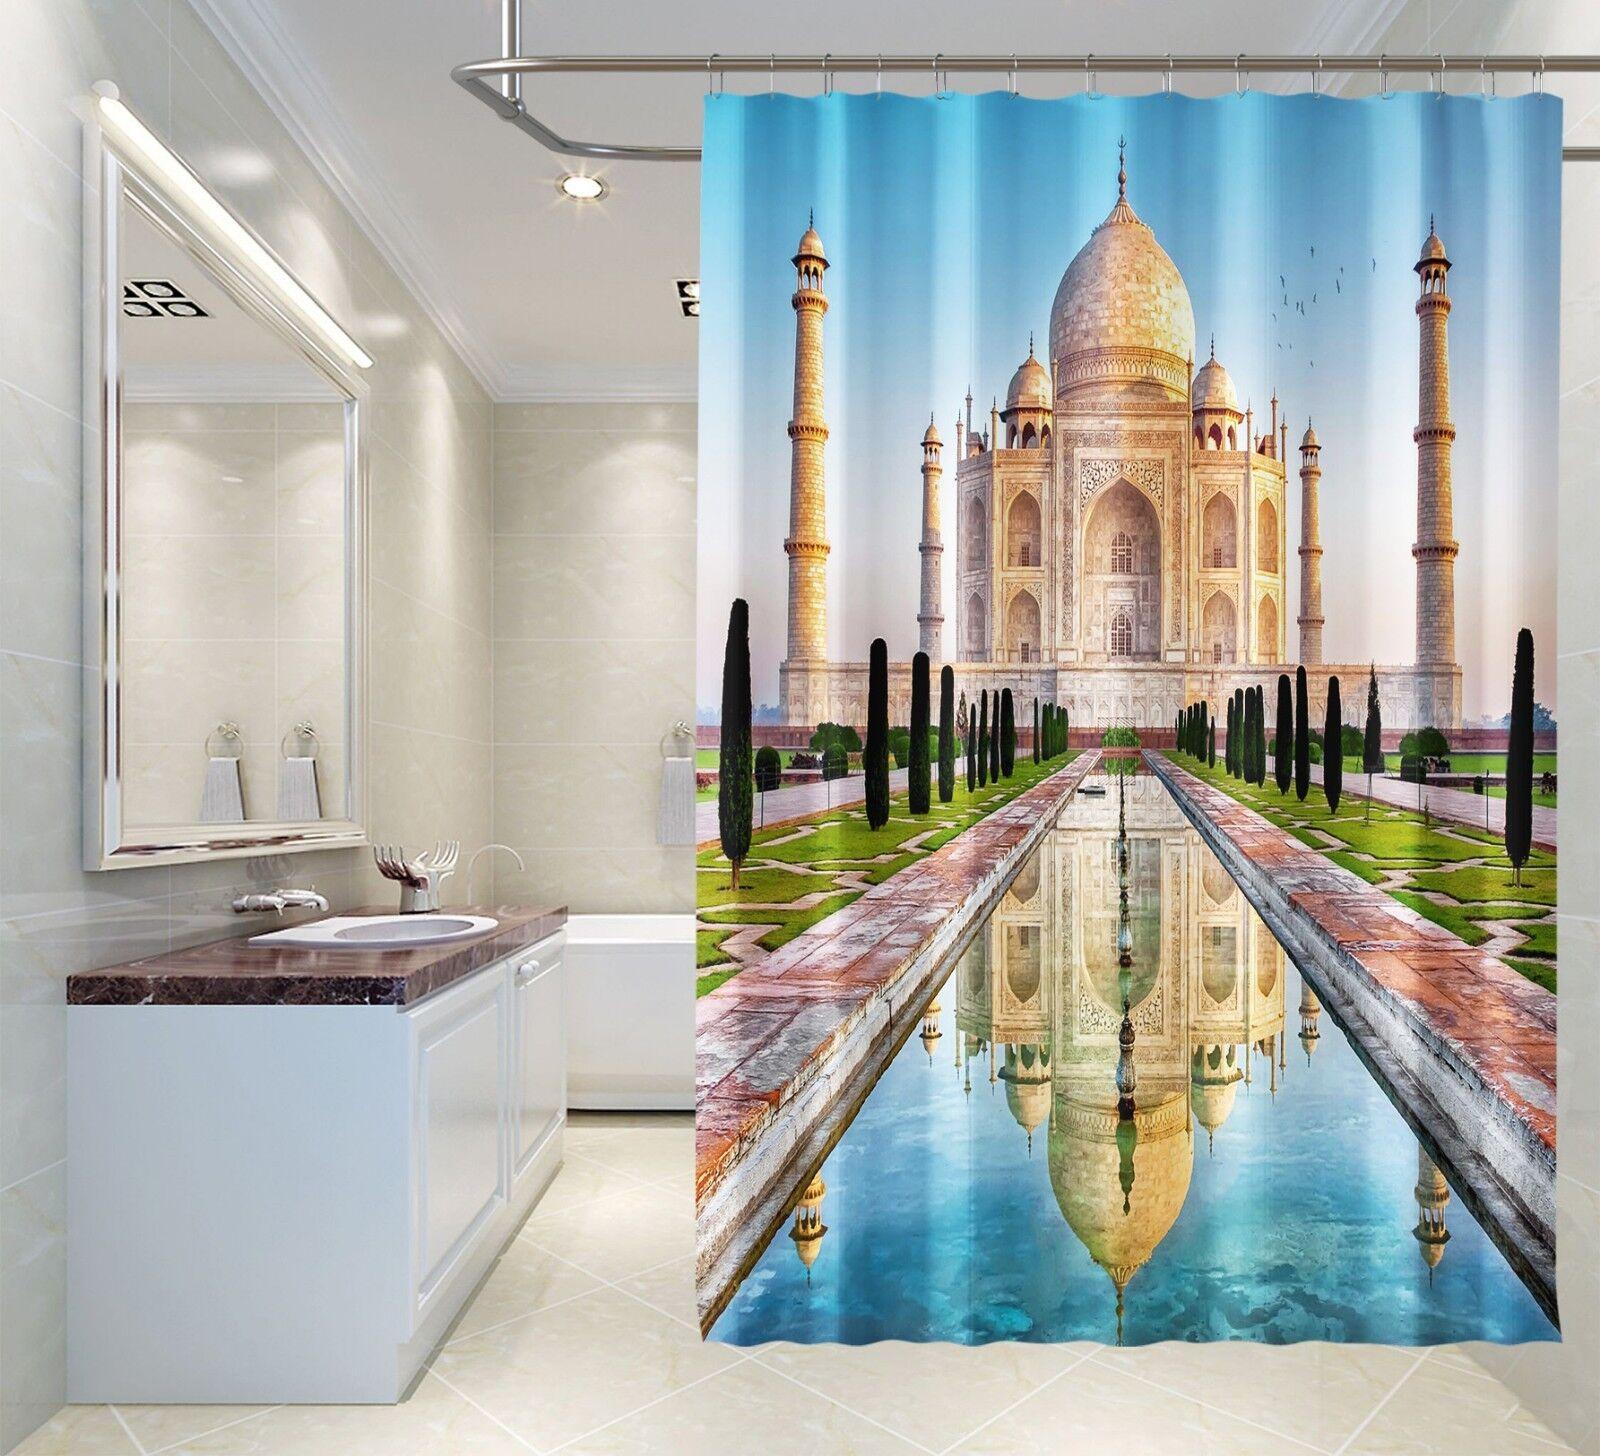 3D Taj Mahal 468 Tenda da doccia IMPERMEABILE Fibra Bagno WC CASA FINESTRE